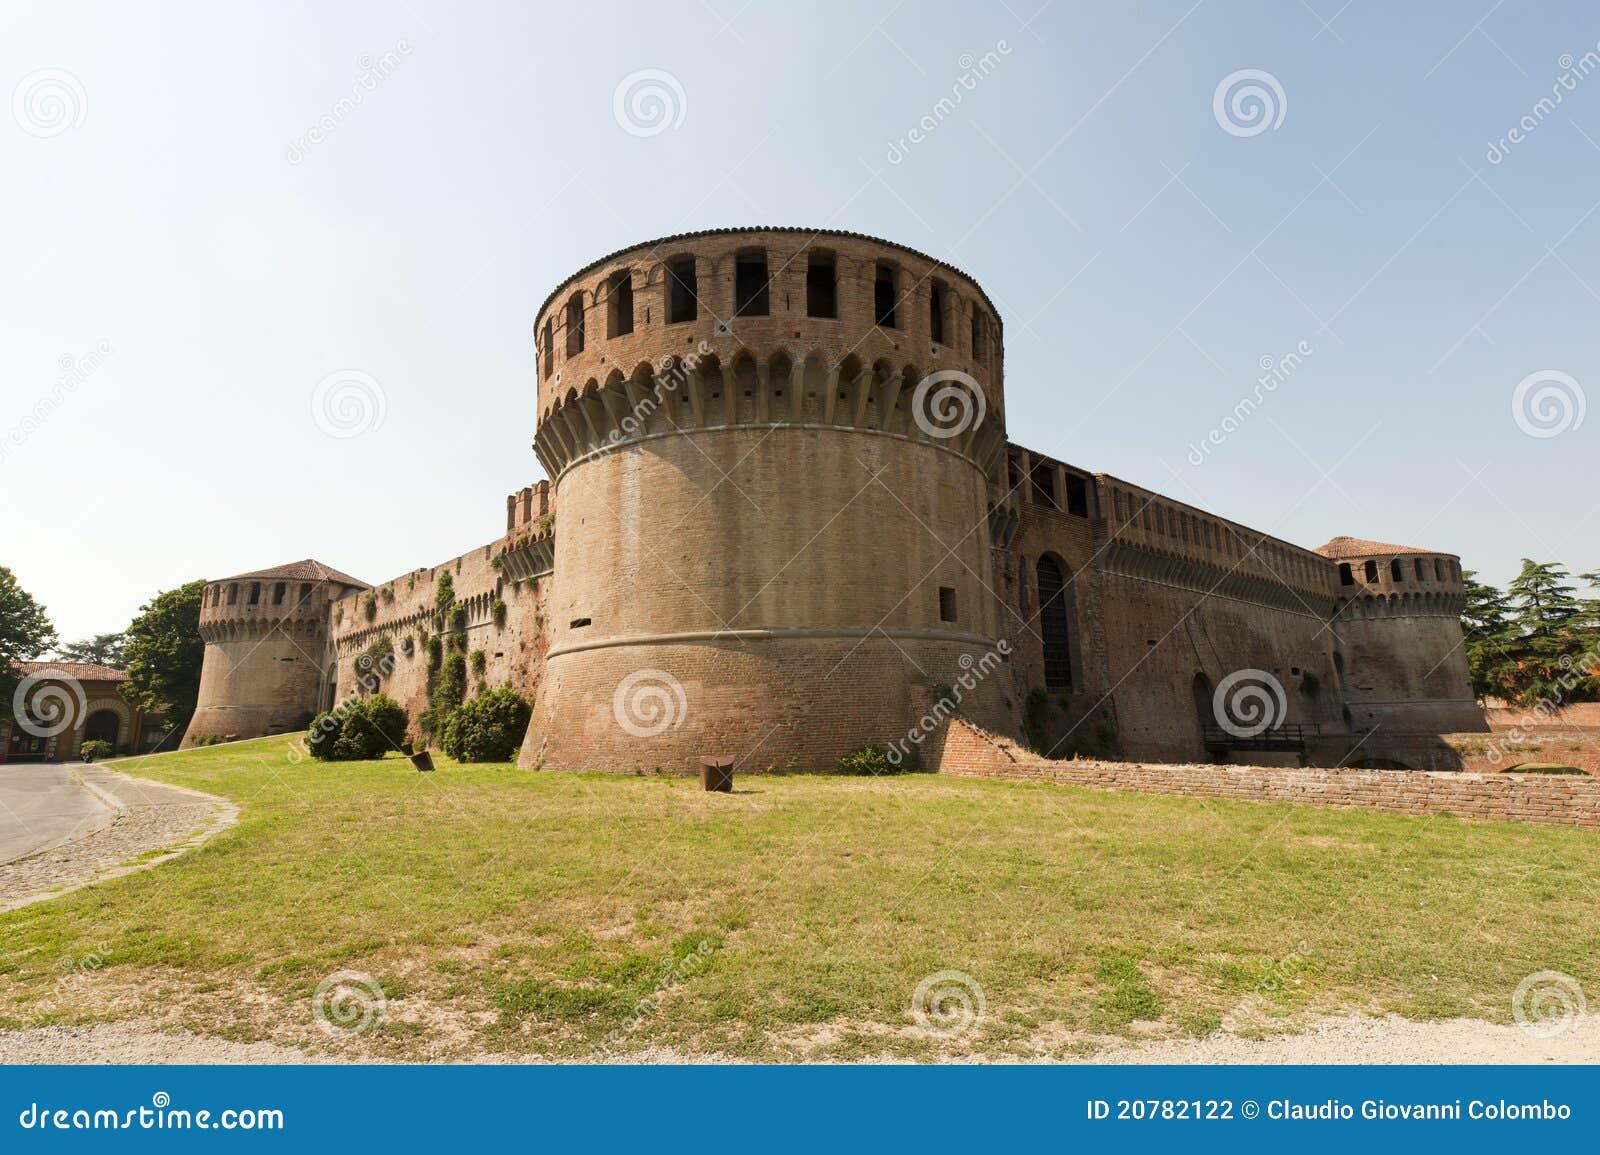 Imola Italy  city photos gallery : Imola Italy Medieval Castle Stock Photography Image: 20782122